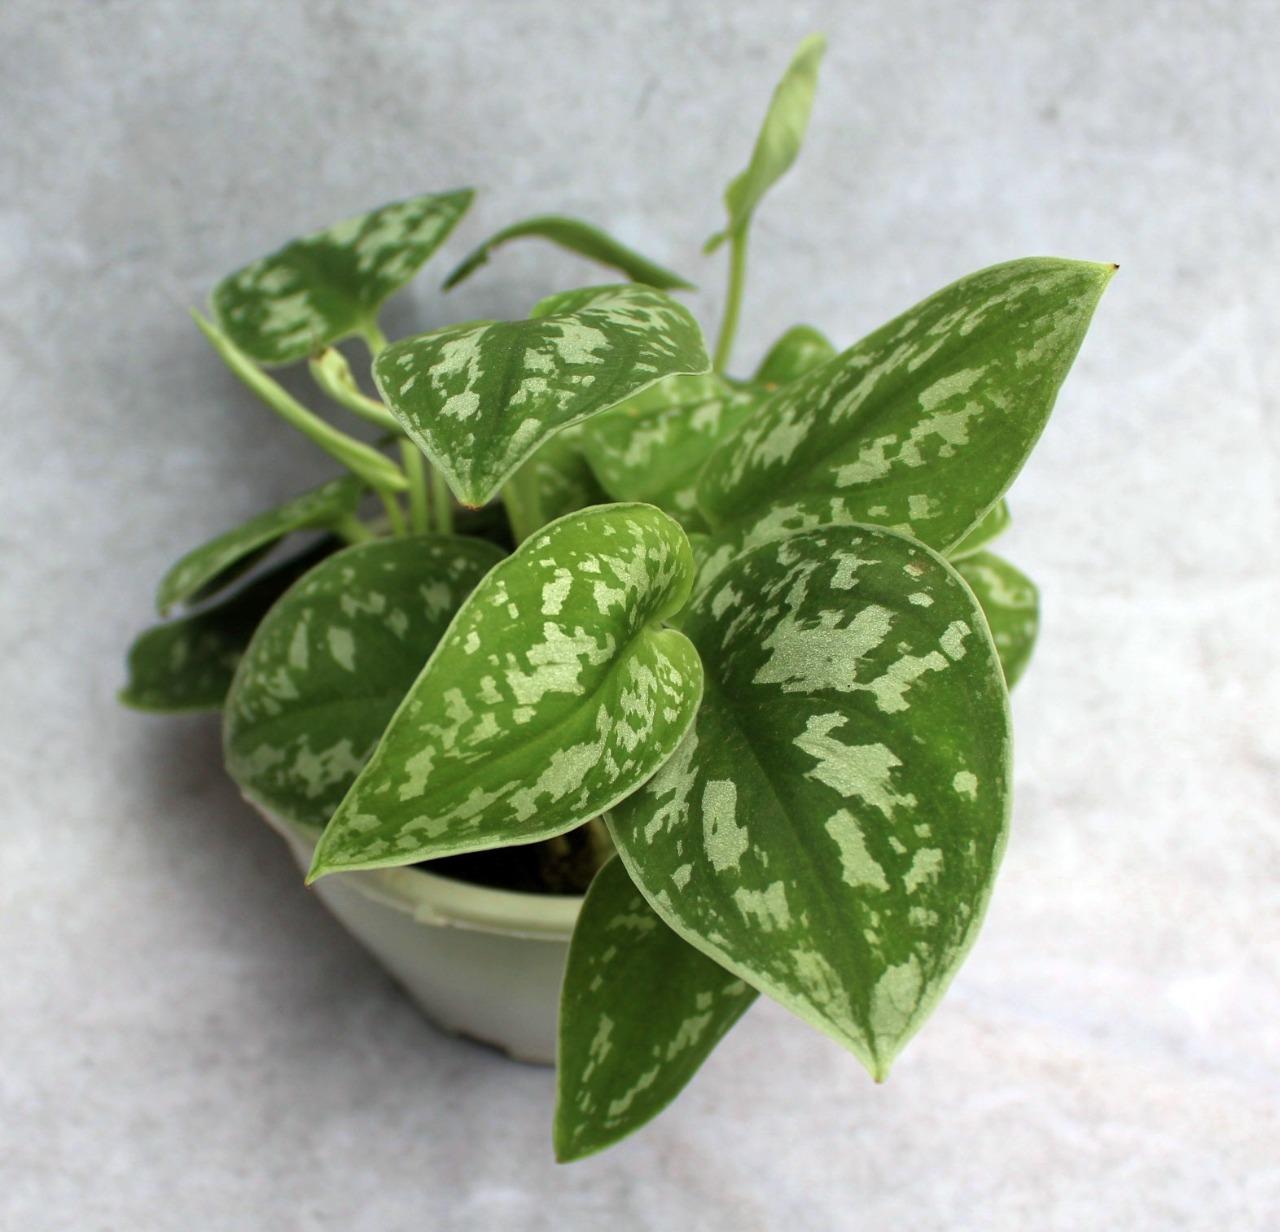 Jibóia Prateada - Cuia 13 (Scindapsus pictus 'Argyraeus')